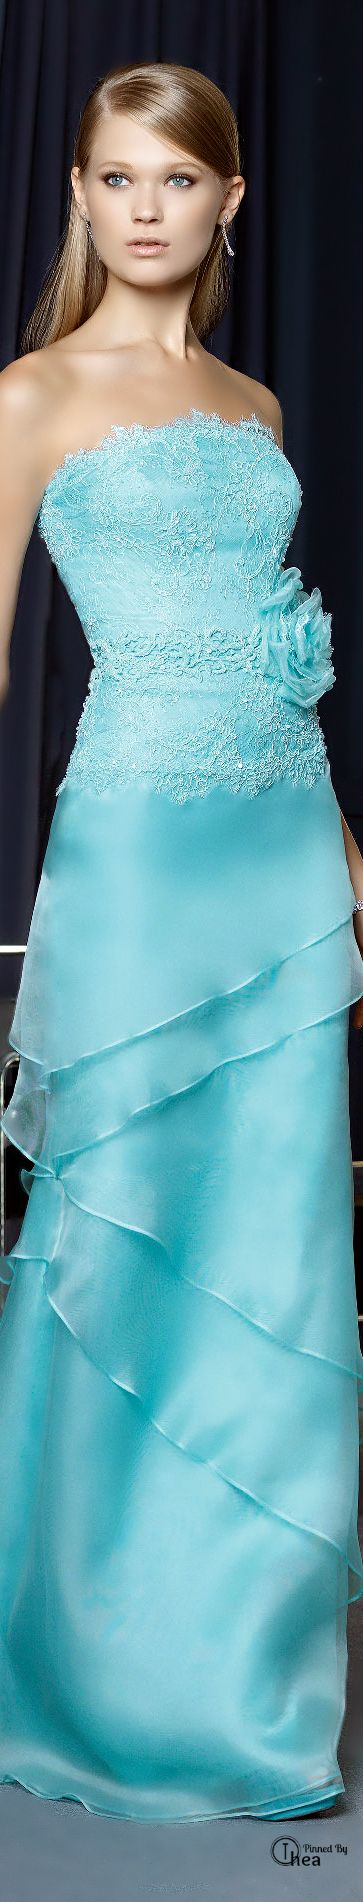 Vestido fiesta escote palabra de honor. Rosa Clará ● 2014 Palabra de www.palmiracompilar.com #homenajeatuangel